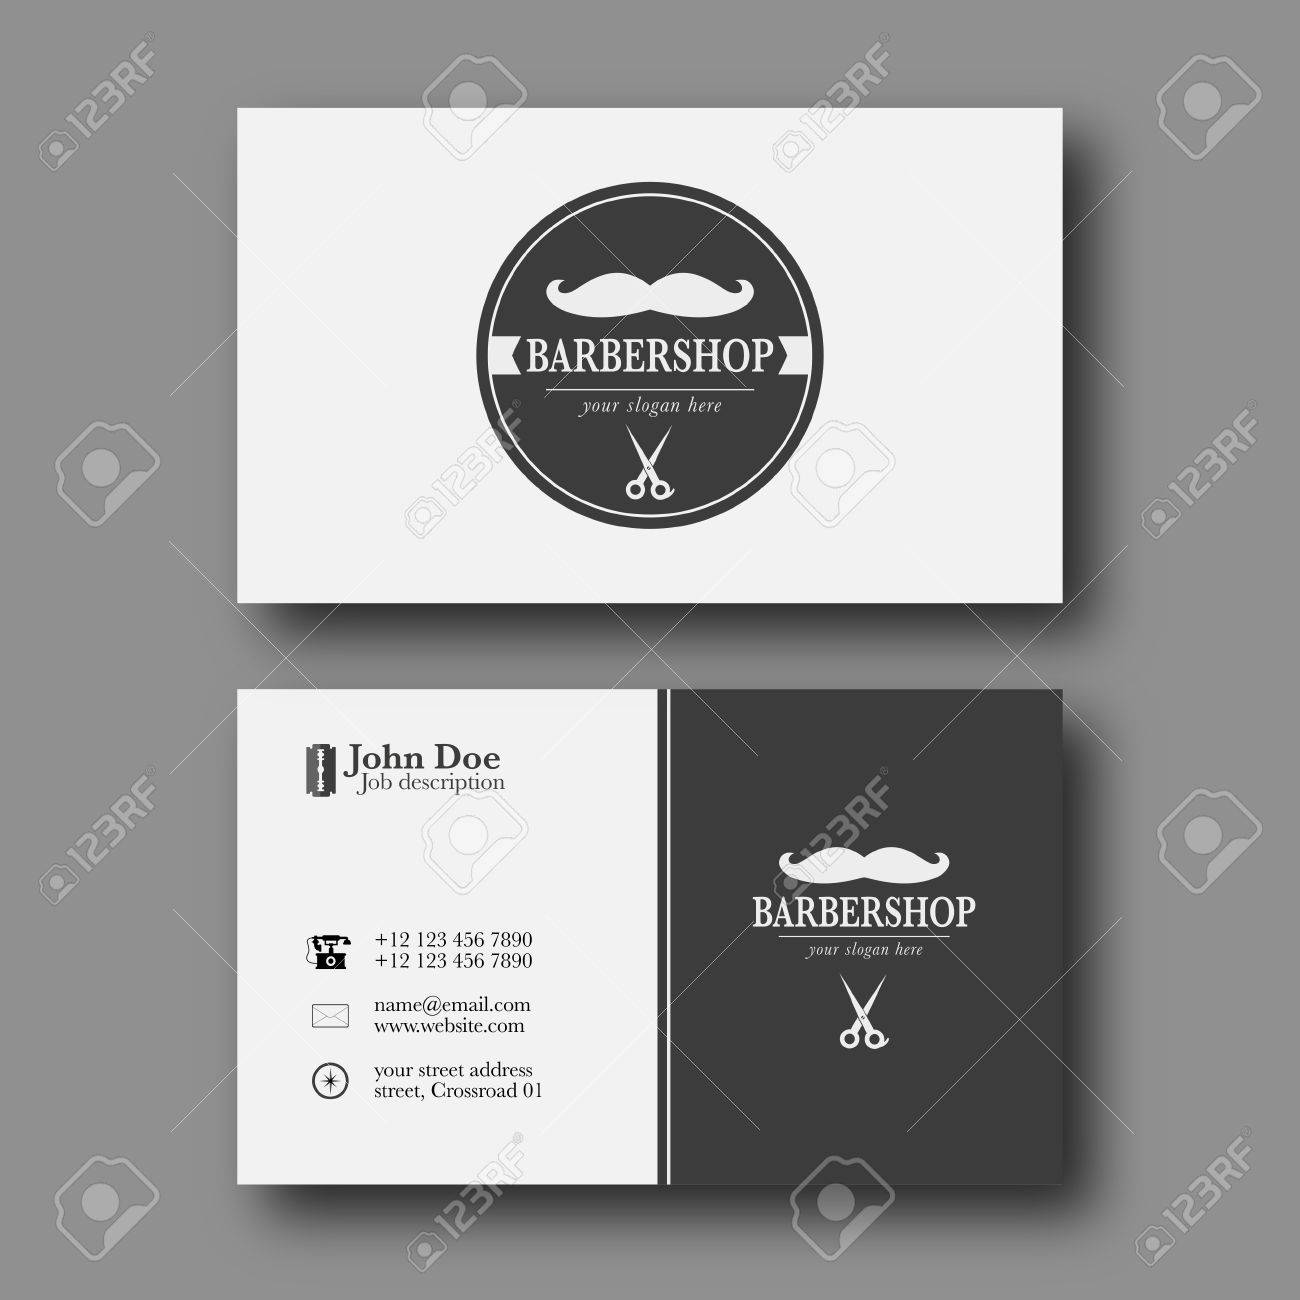 Abstract elegant barber shop business card template royalty free abstract elegant barber shop business card template stock vector 65834457 wajeb Choice Image